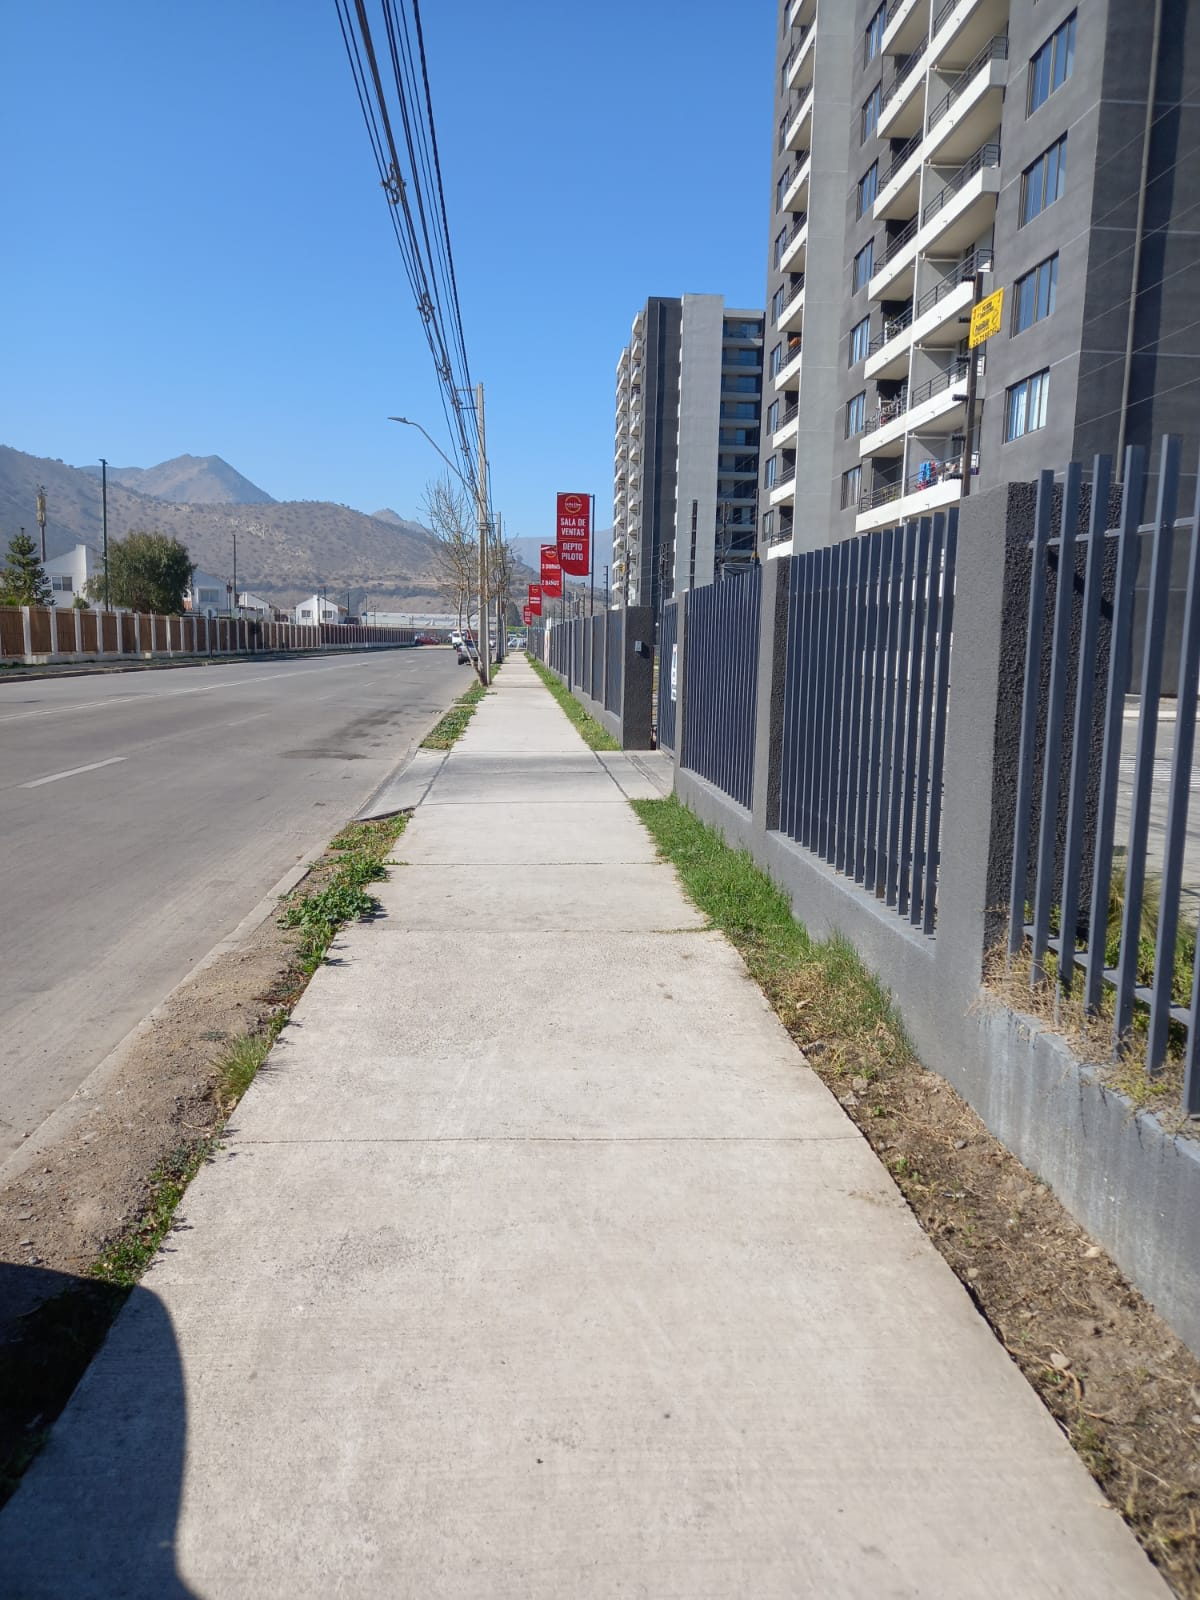 Platabanda Sur Santa Elena (1180 m2)